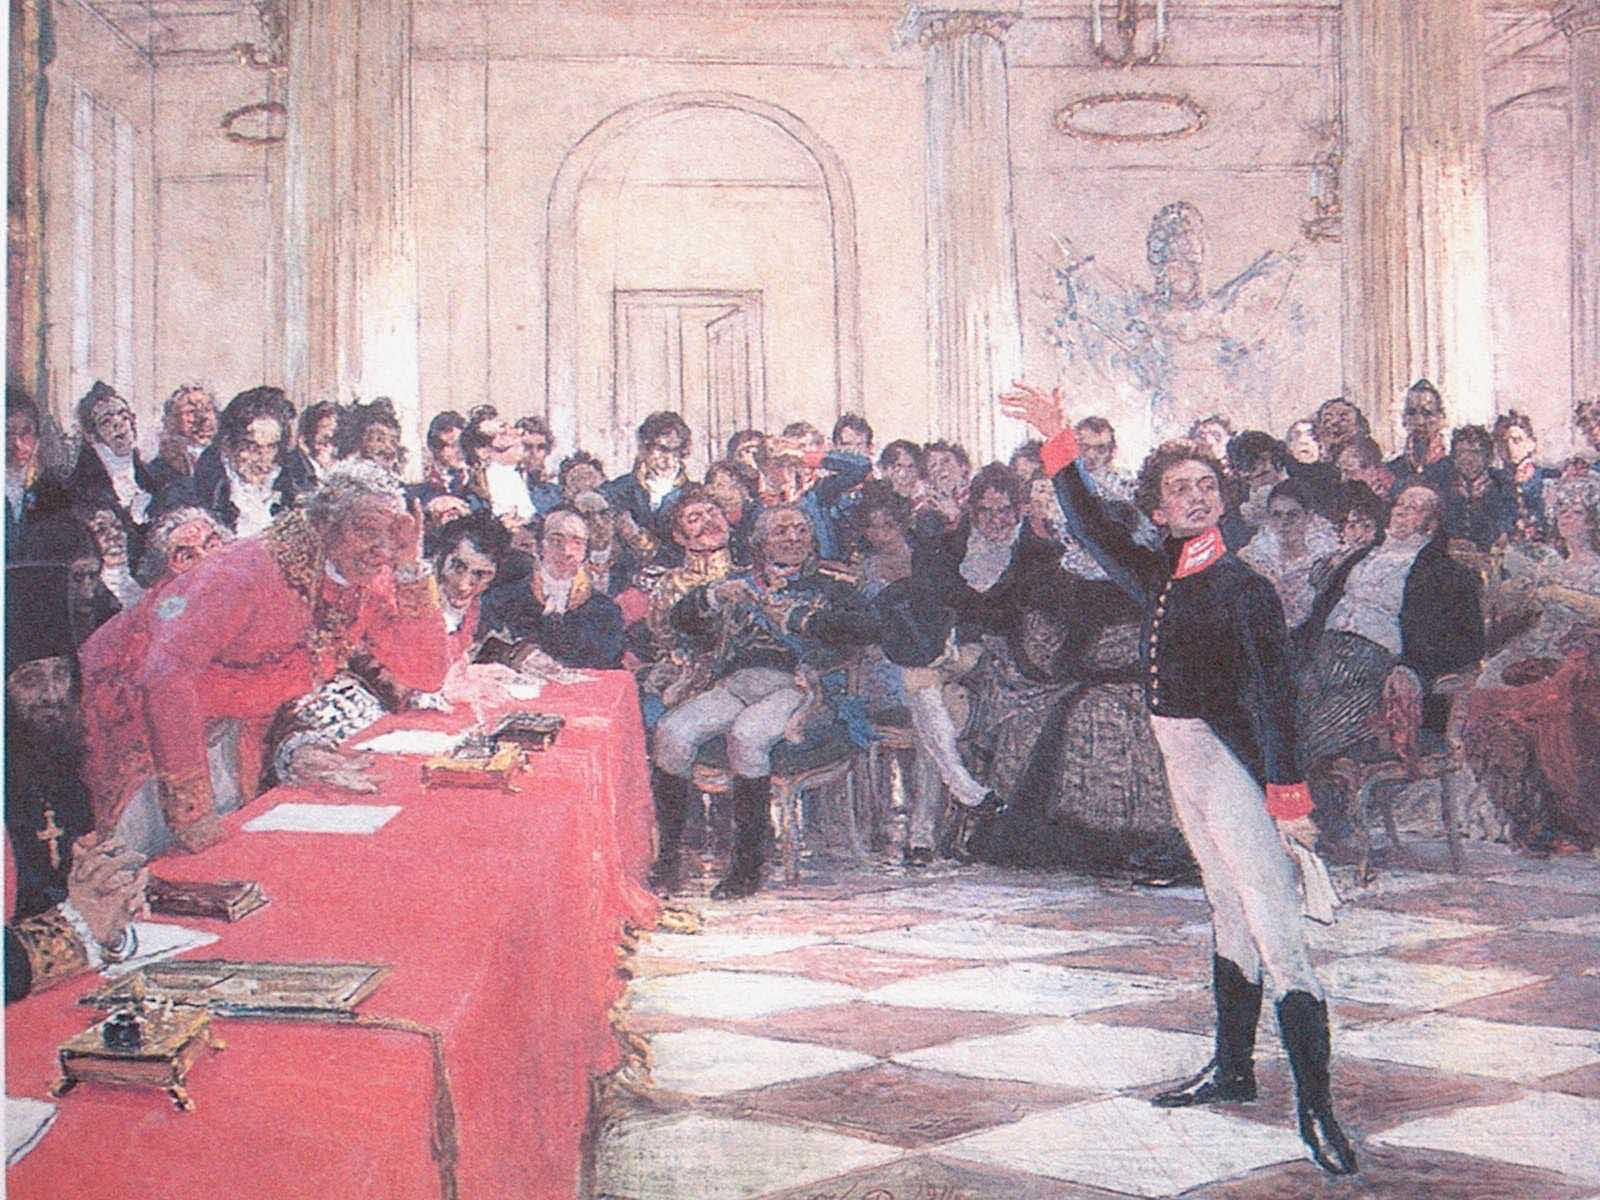 Доклад на тему петербургский период в жизни пушкина 392